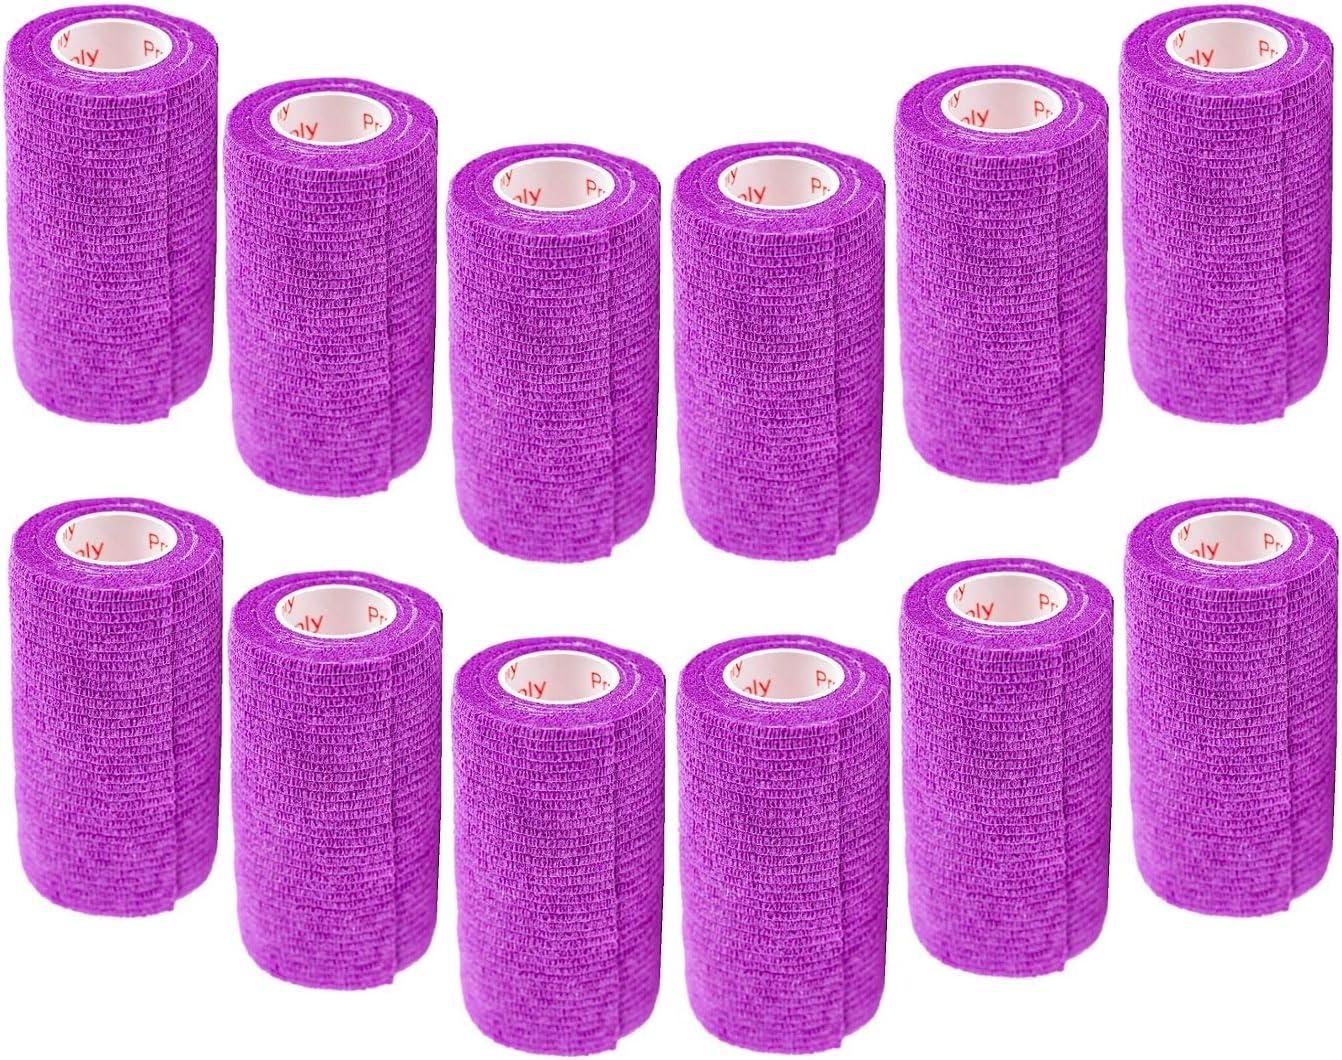 4 Inch Vet Wrap Tape Bulk (Assorted Colors) (6, 12, 18, or 24 Packs) Self-Adhesive Self Adherent Adhering Flex Bandage Rap Grip Roll for Dog Cat Pet Horse 81bg0hxLZZL